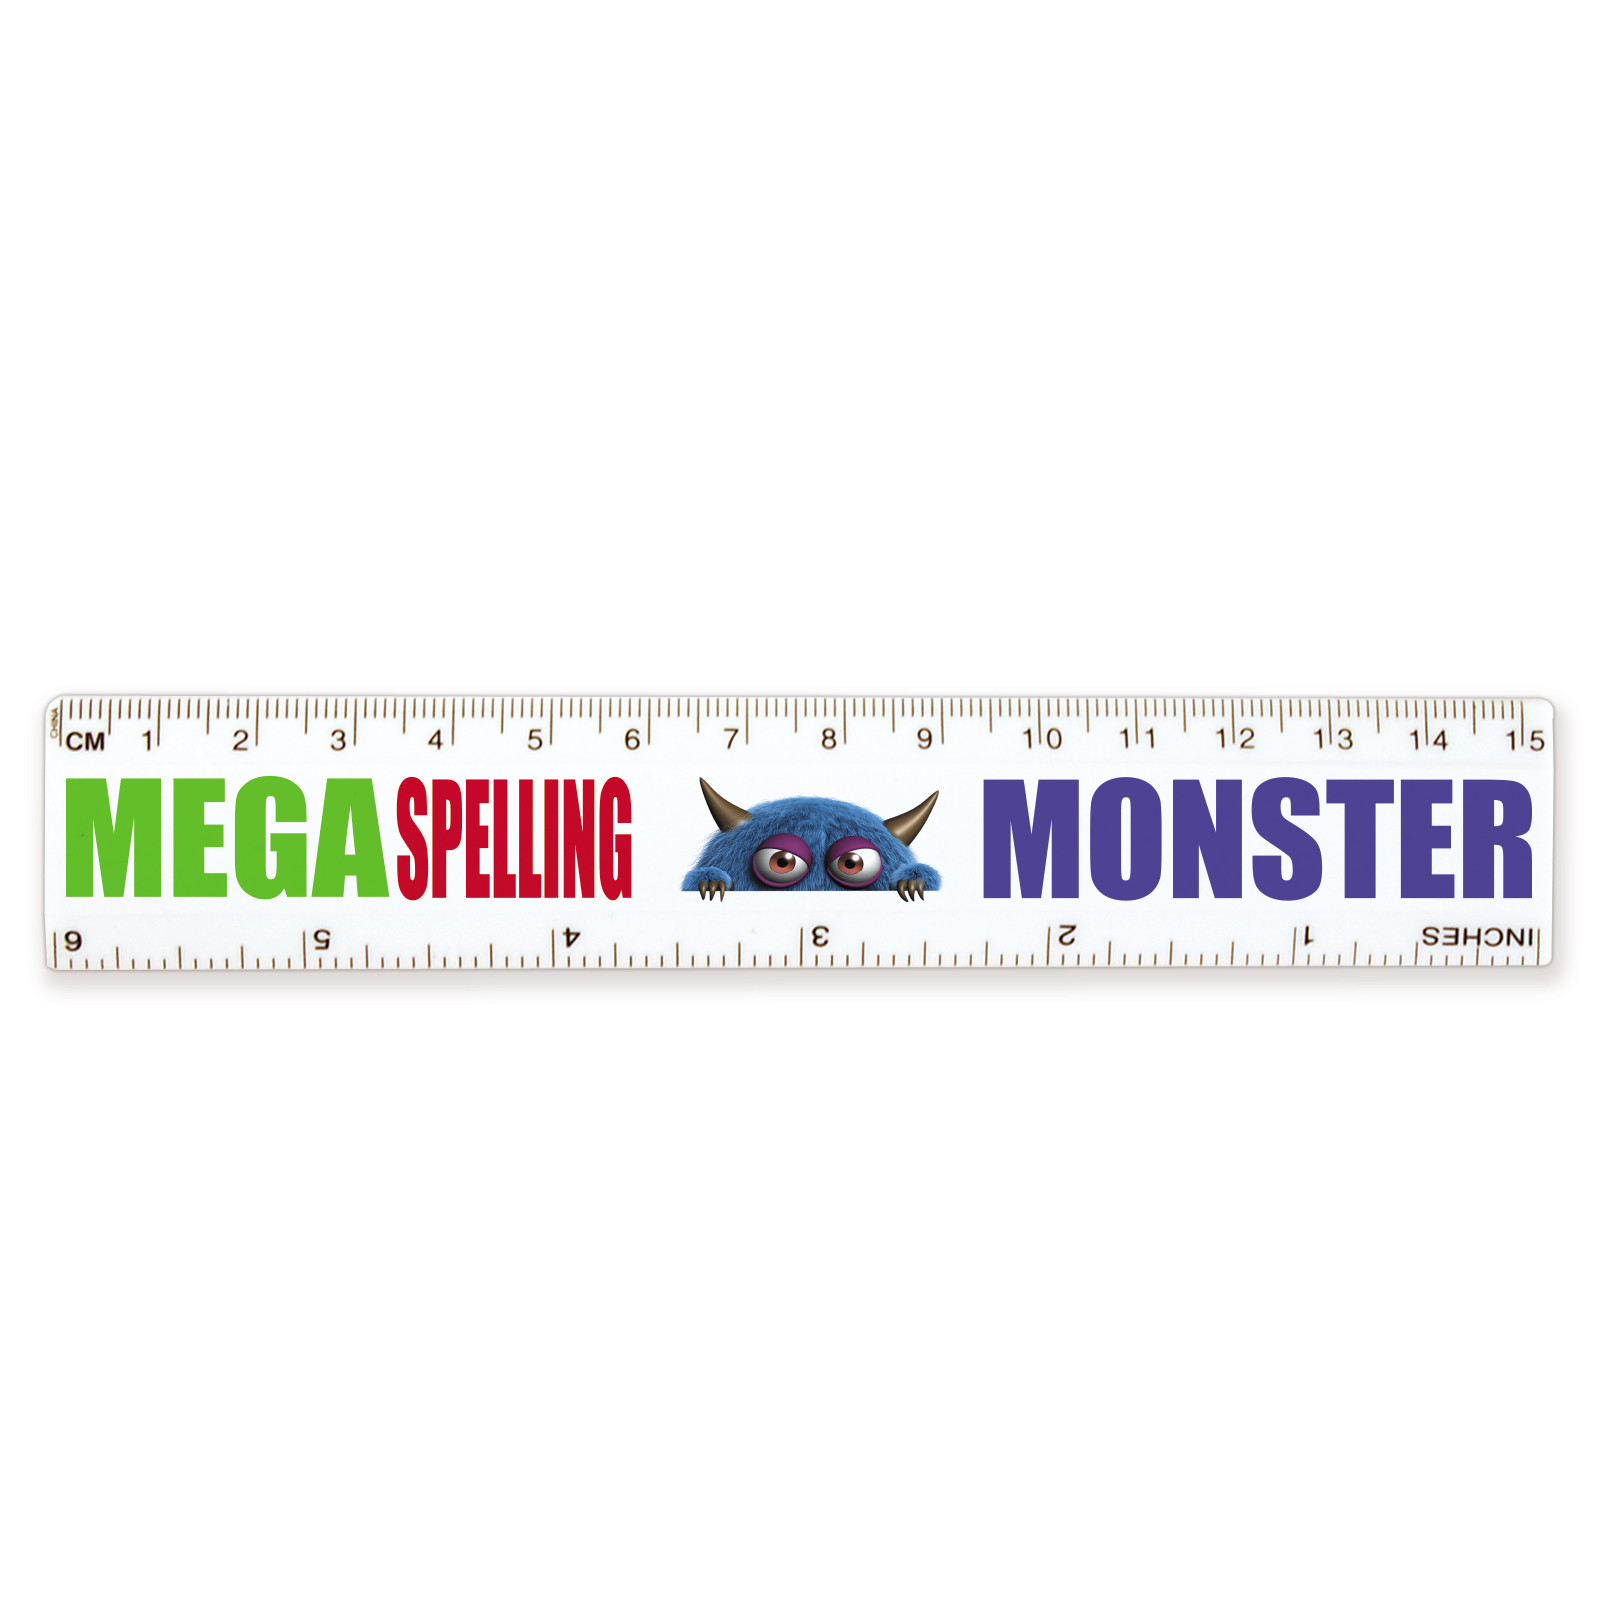 Promotional Product * 15cm White Plastic Ruler